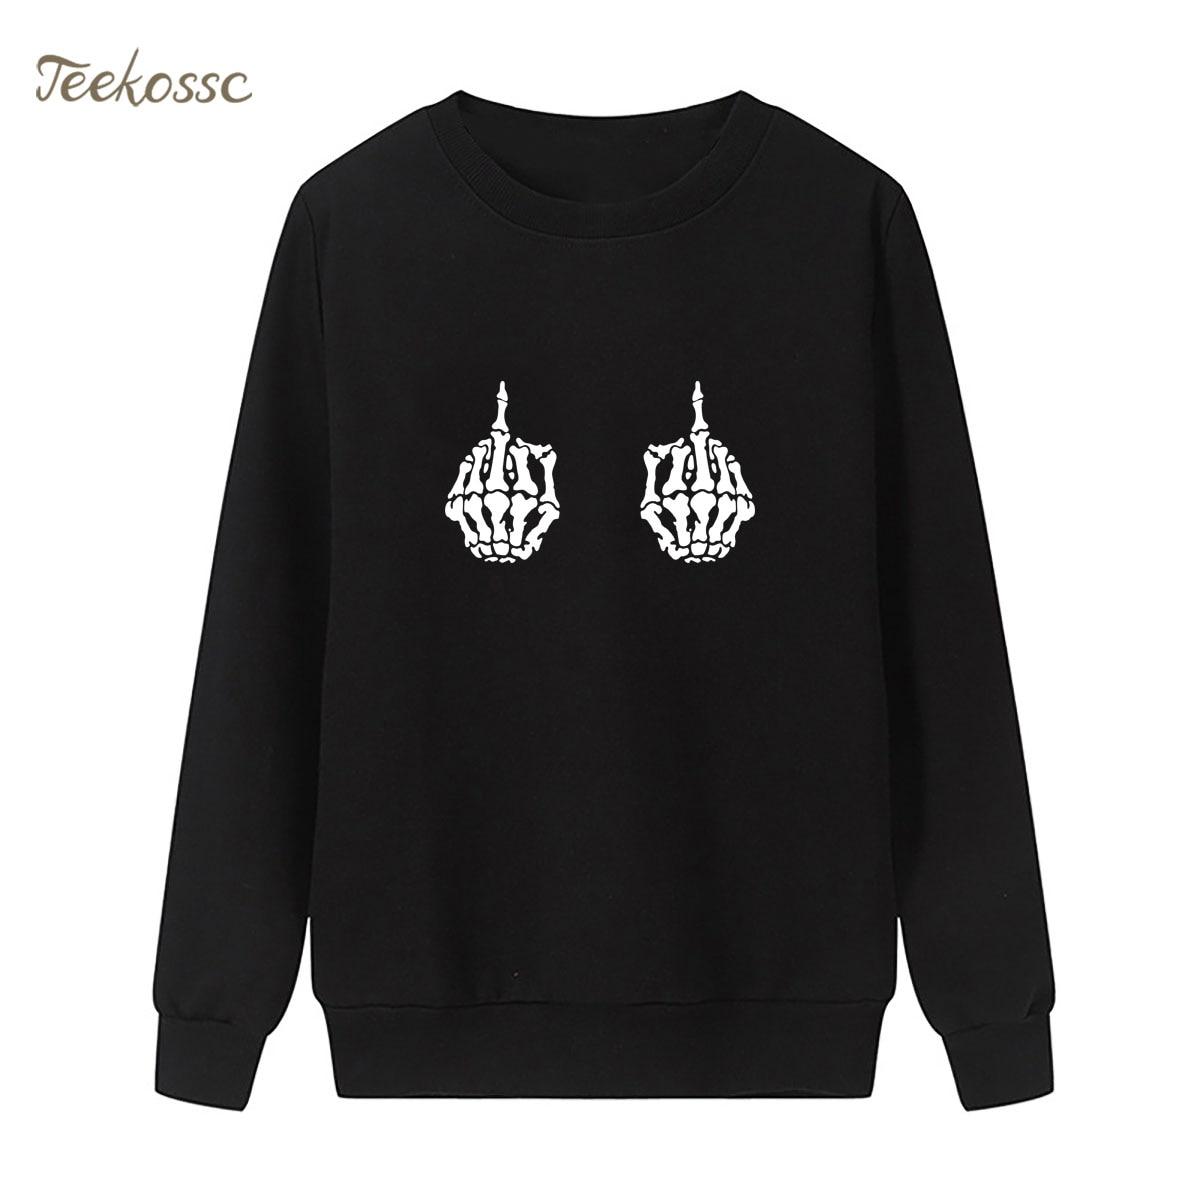 Skull Skeleton Hand Sweatshirt Hip Hop Hoodie New Brand Winter Autumn Women Lasdies Pullover Fleece Loose Punk Rock Streetwear